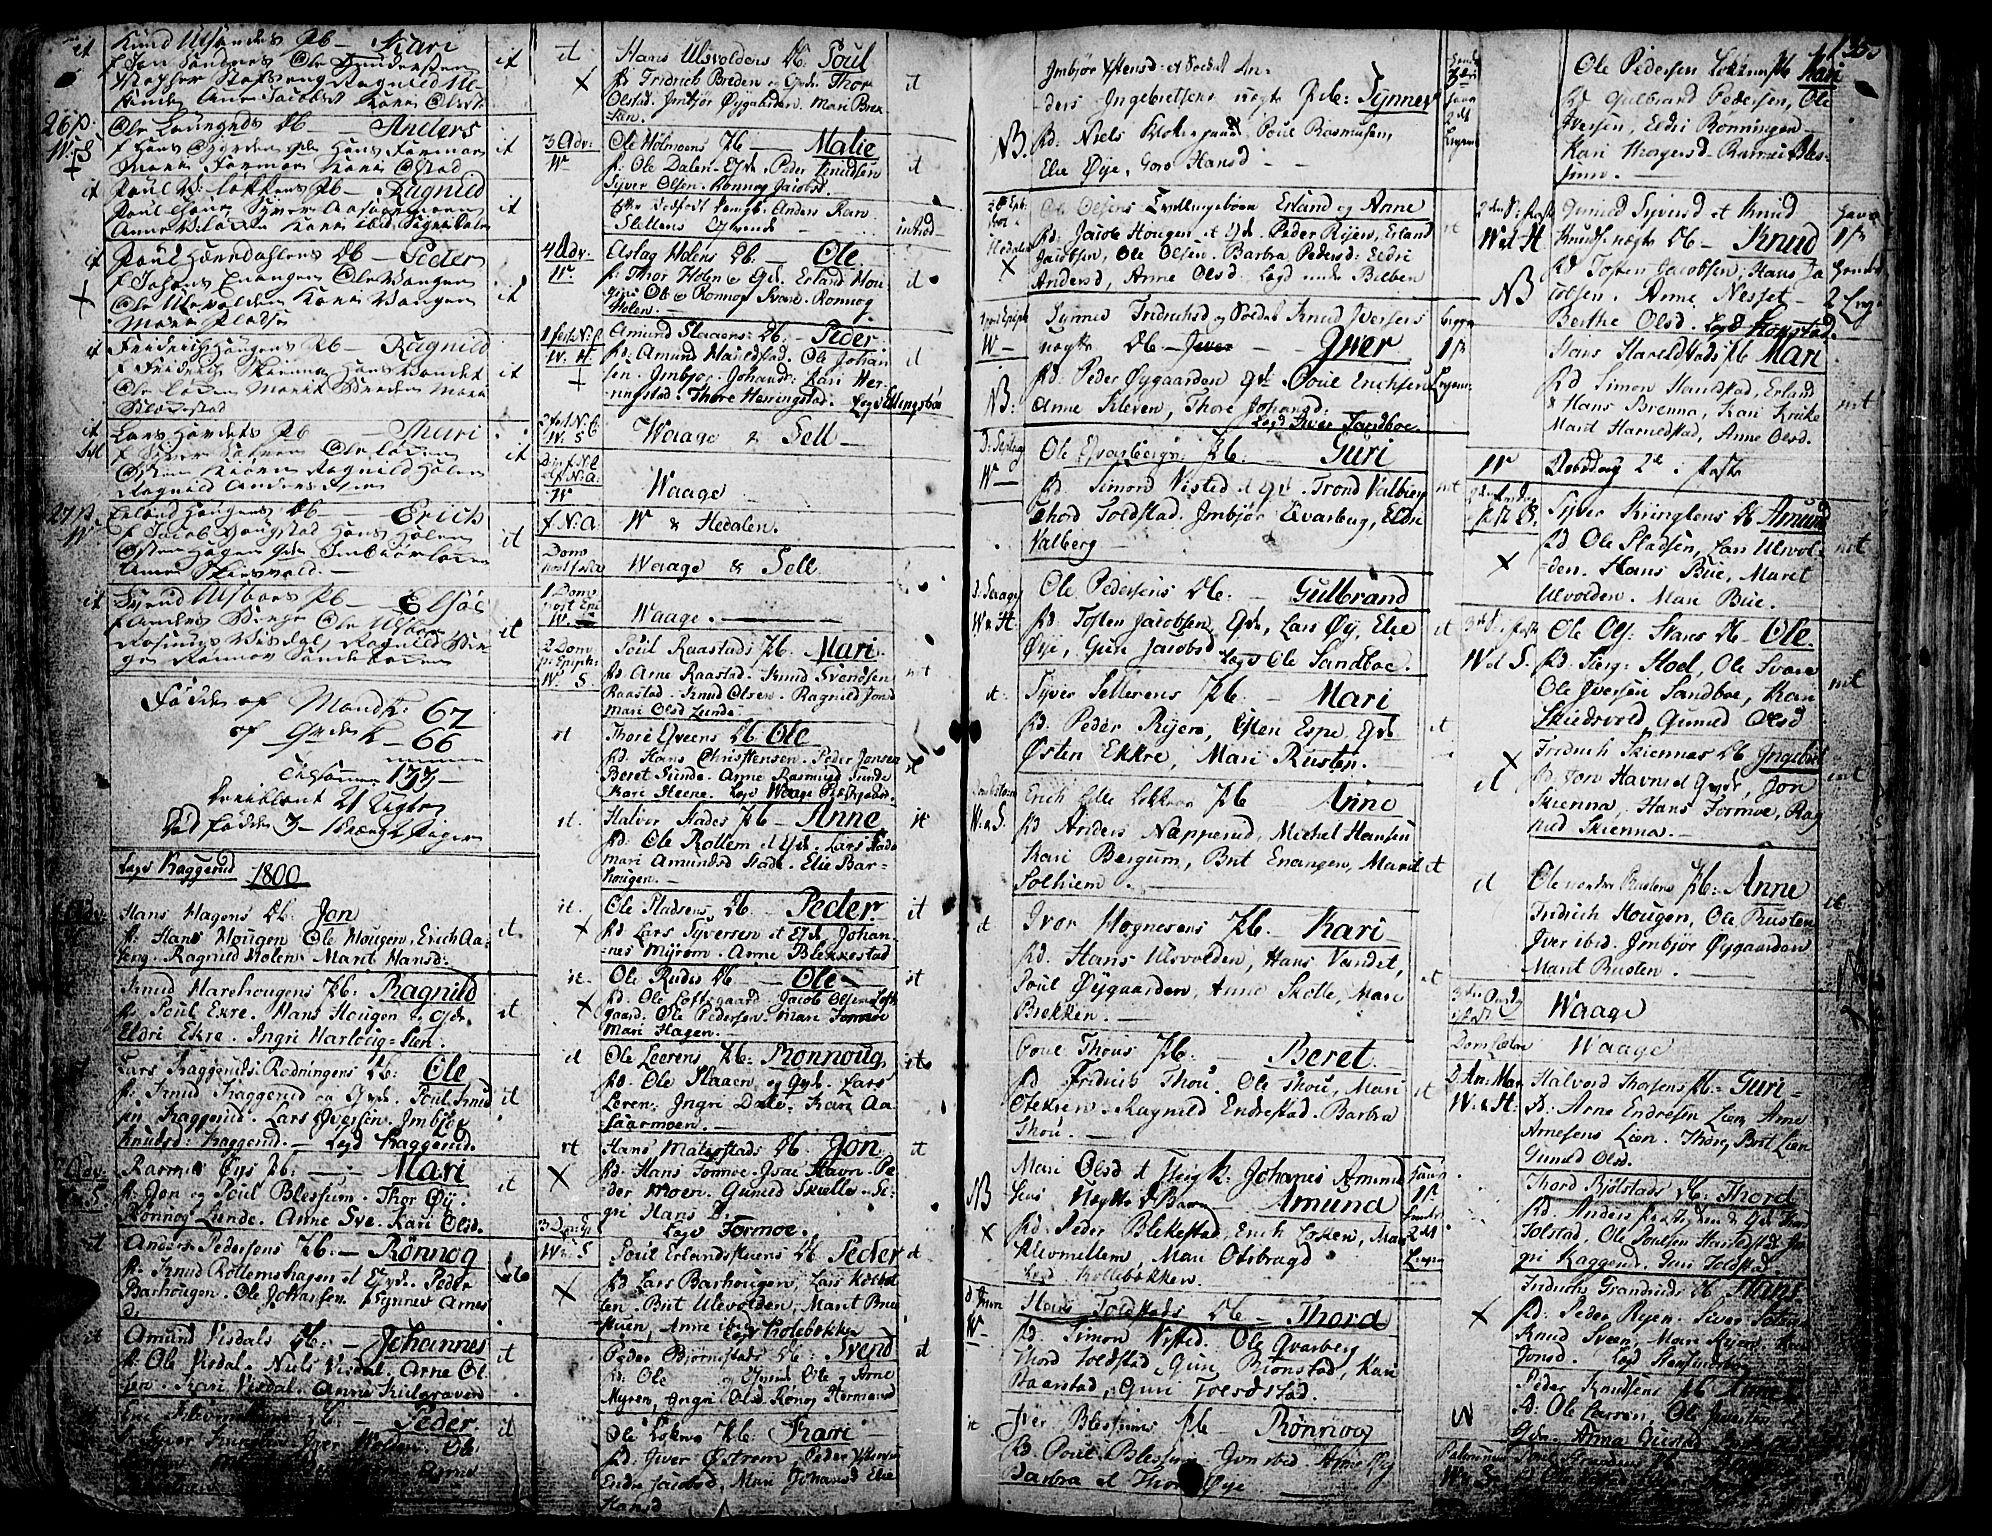 SAH, Vågå prestekontor, Ministerialbok nr. 1, 1739-1810, s. 135